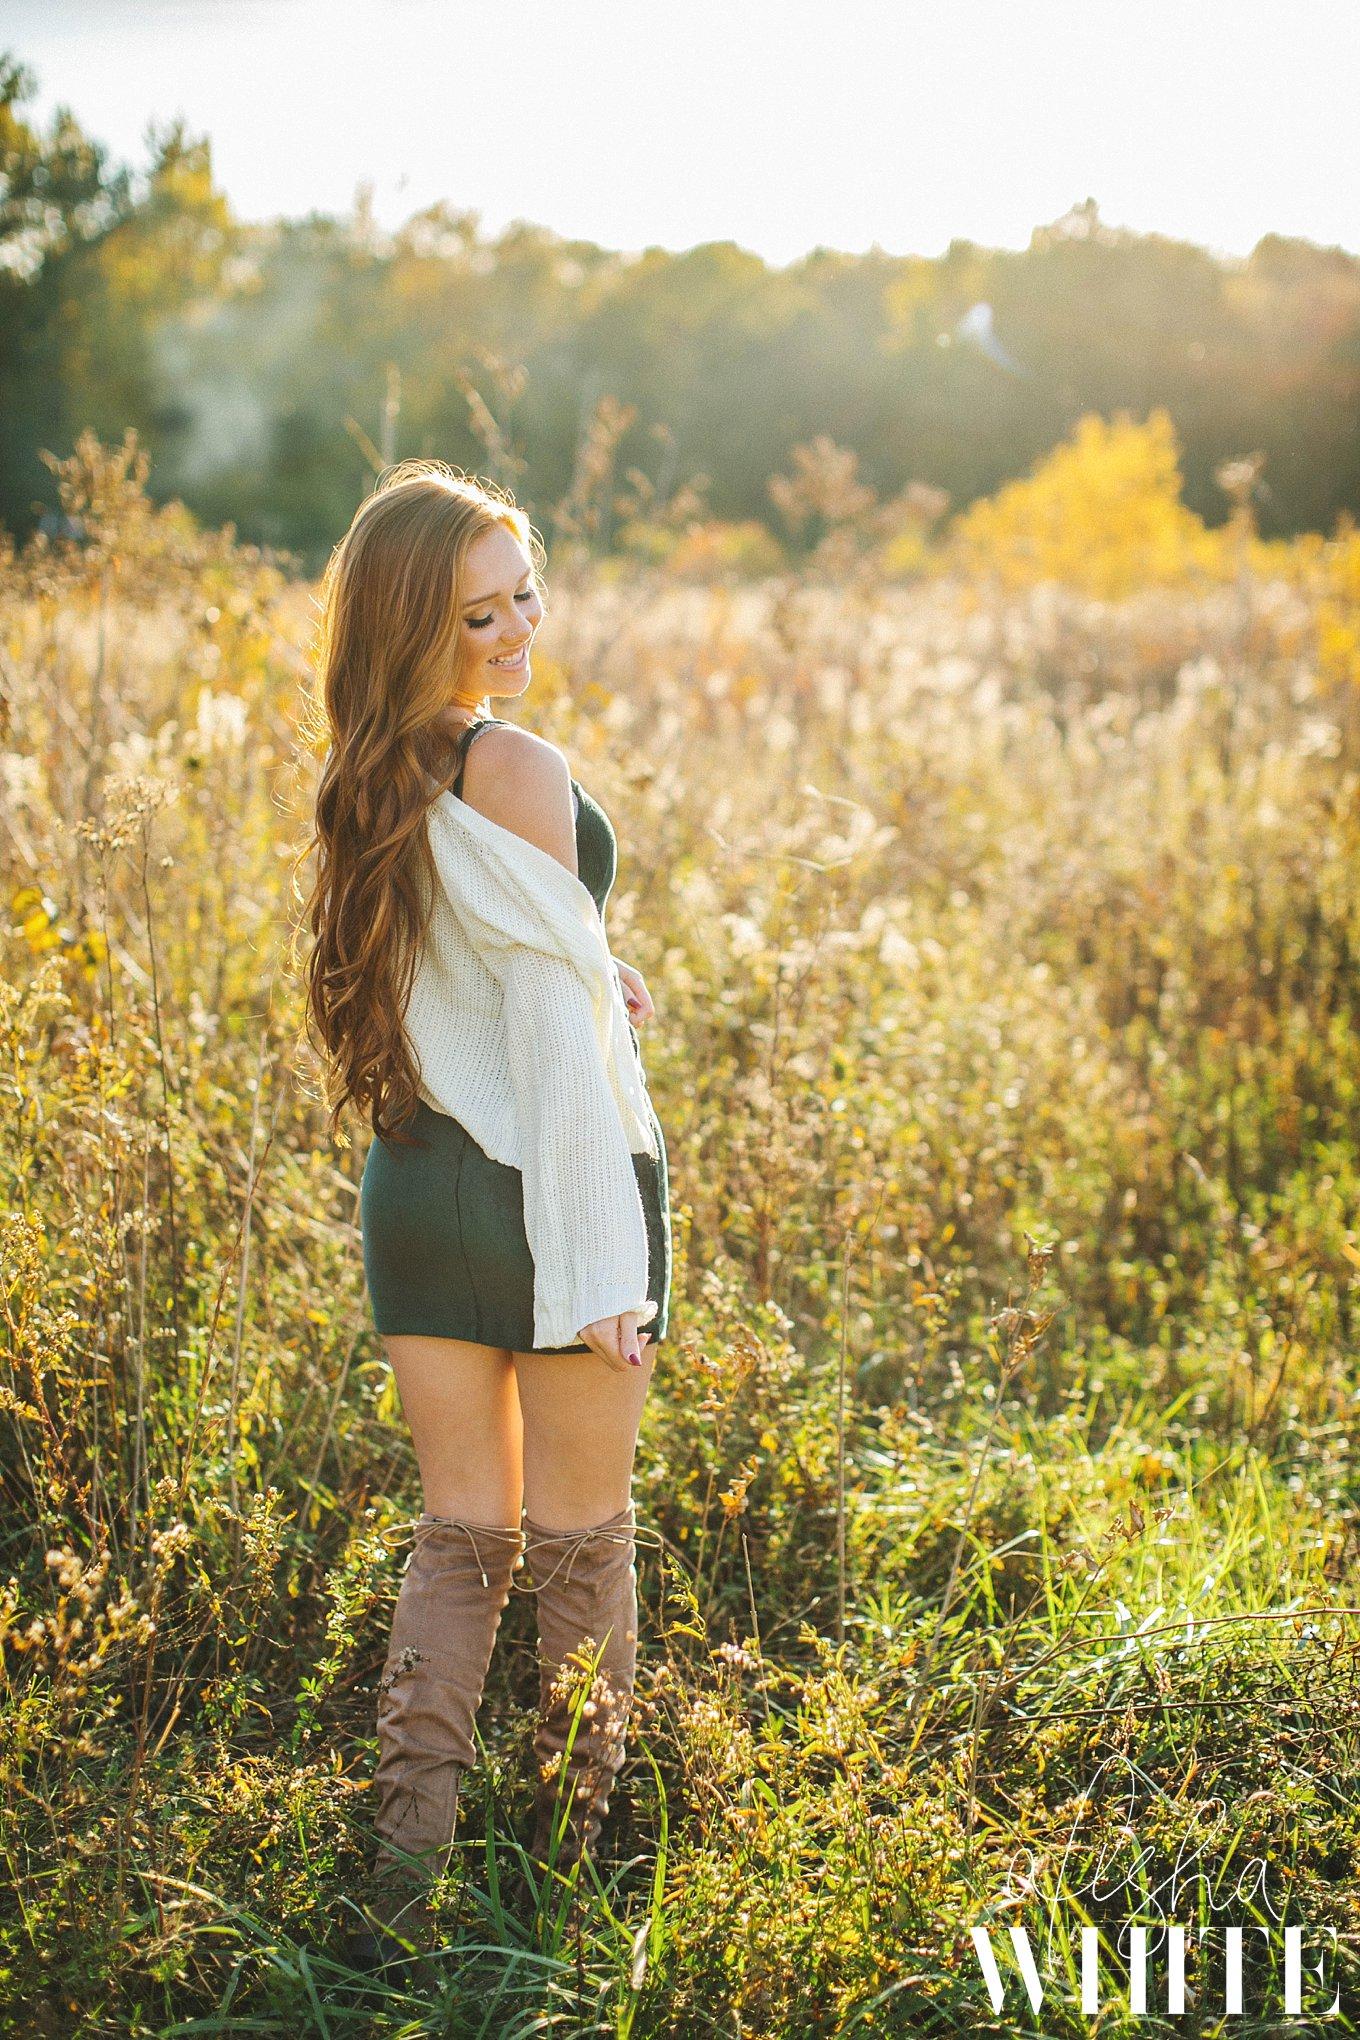 seniorphotography.jpg